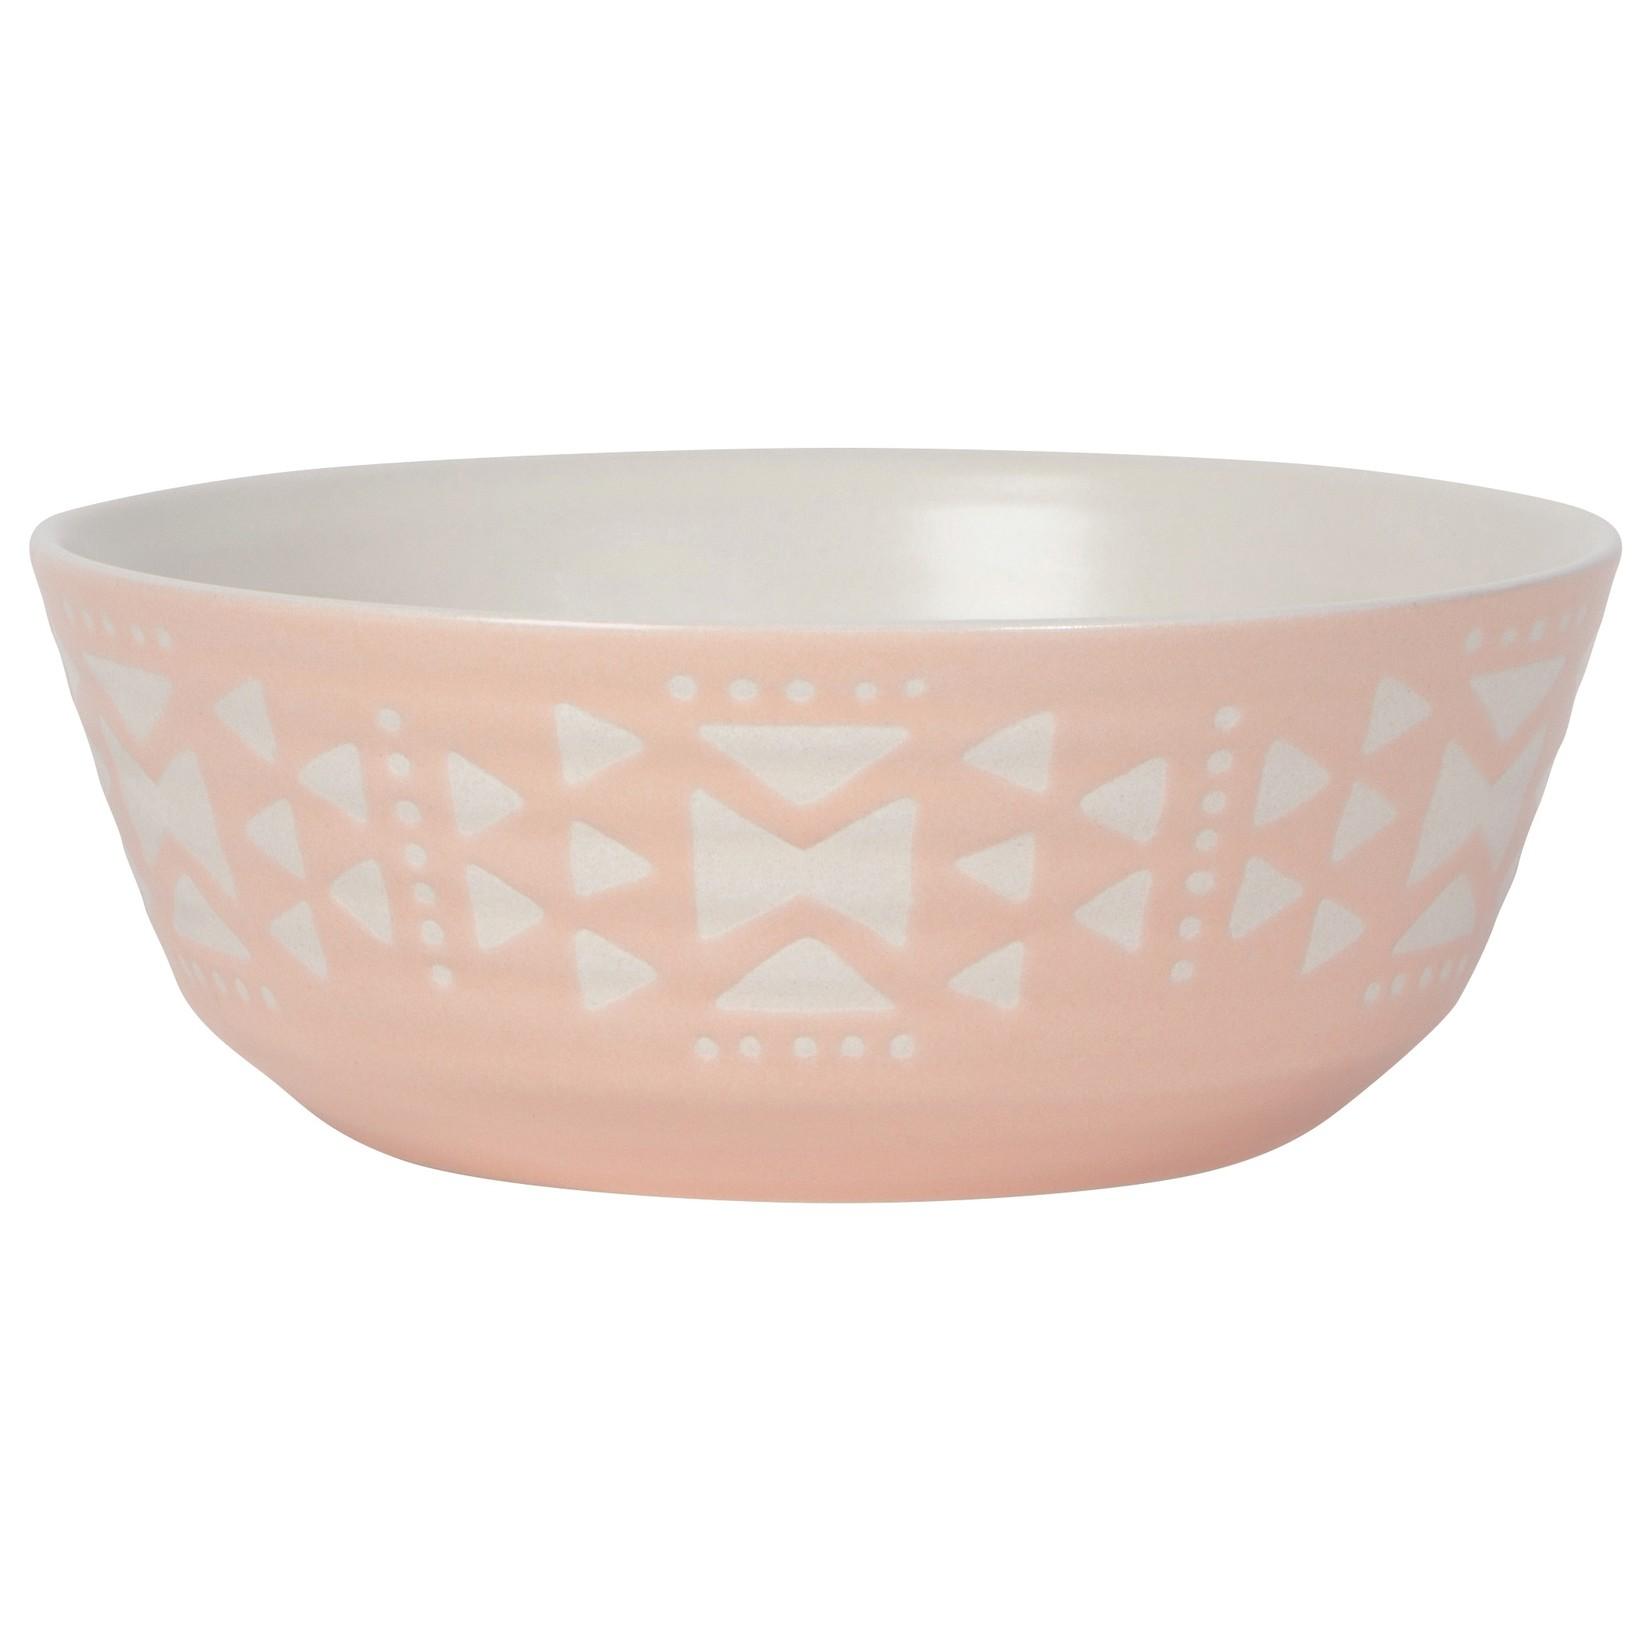 Danica Studio Imprint Bowl